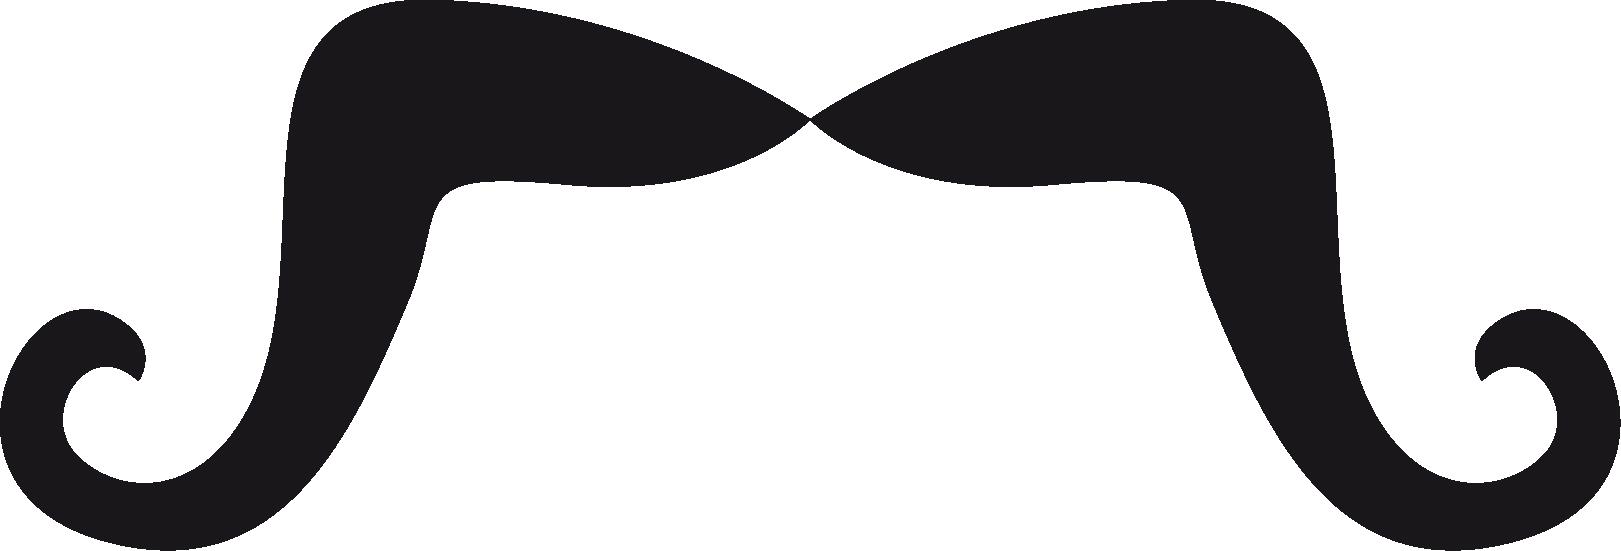 Moustache clipart transparent background. Png images all